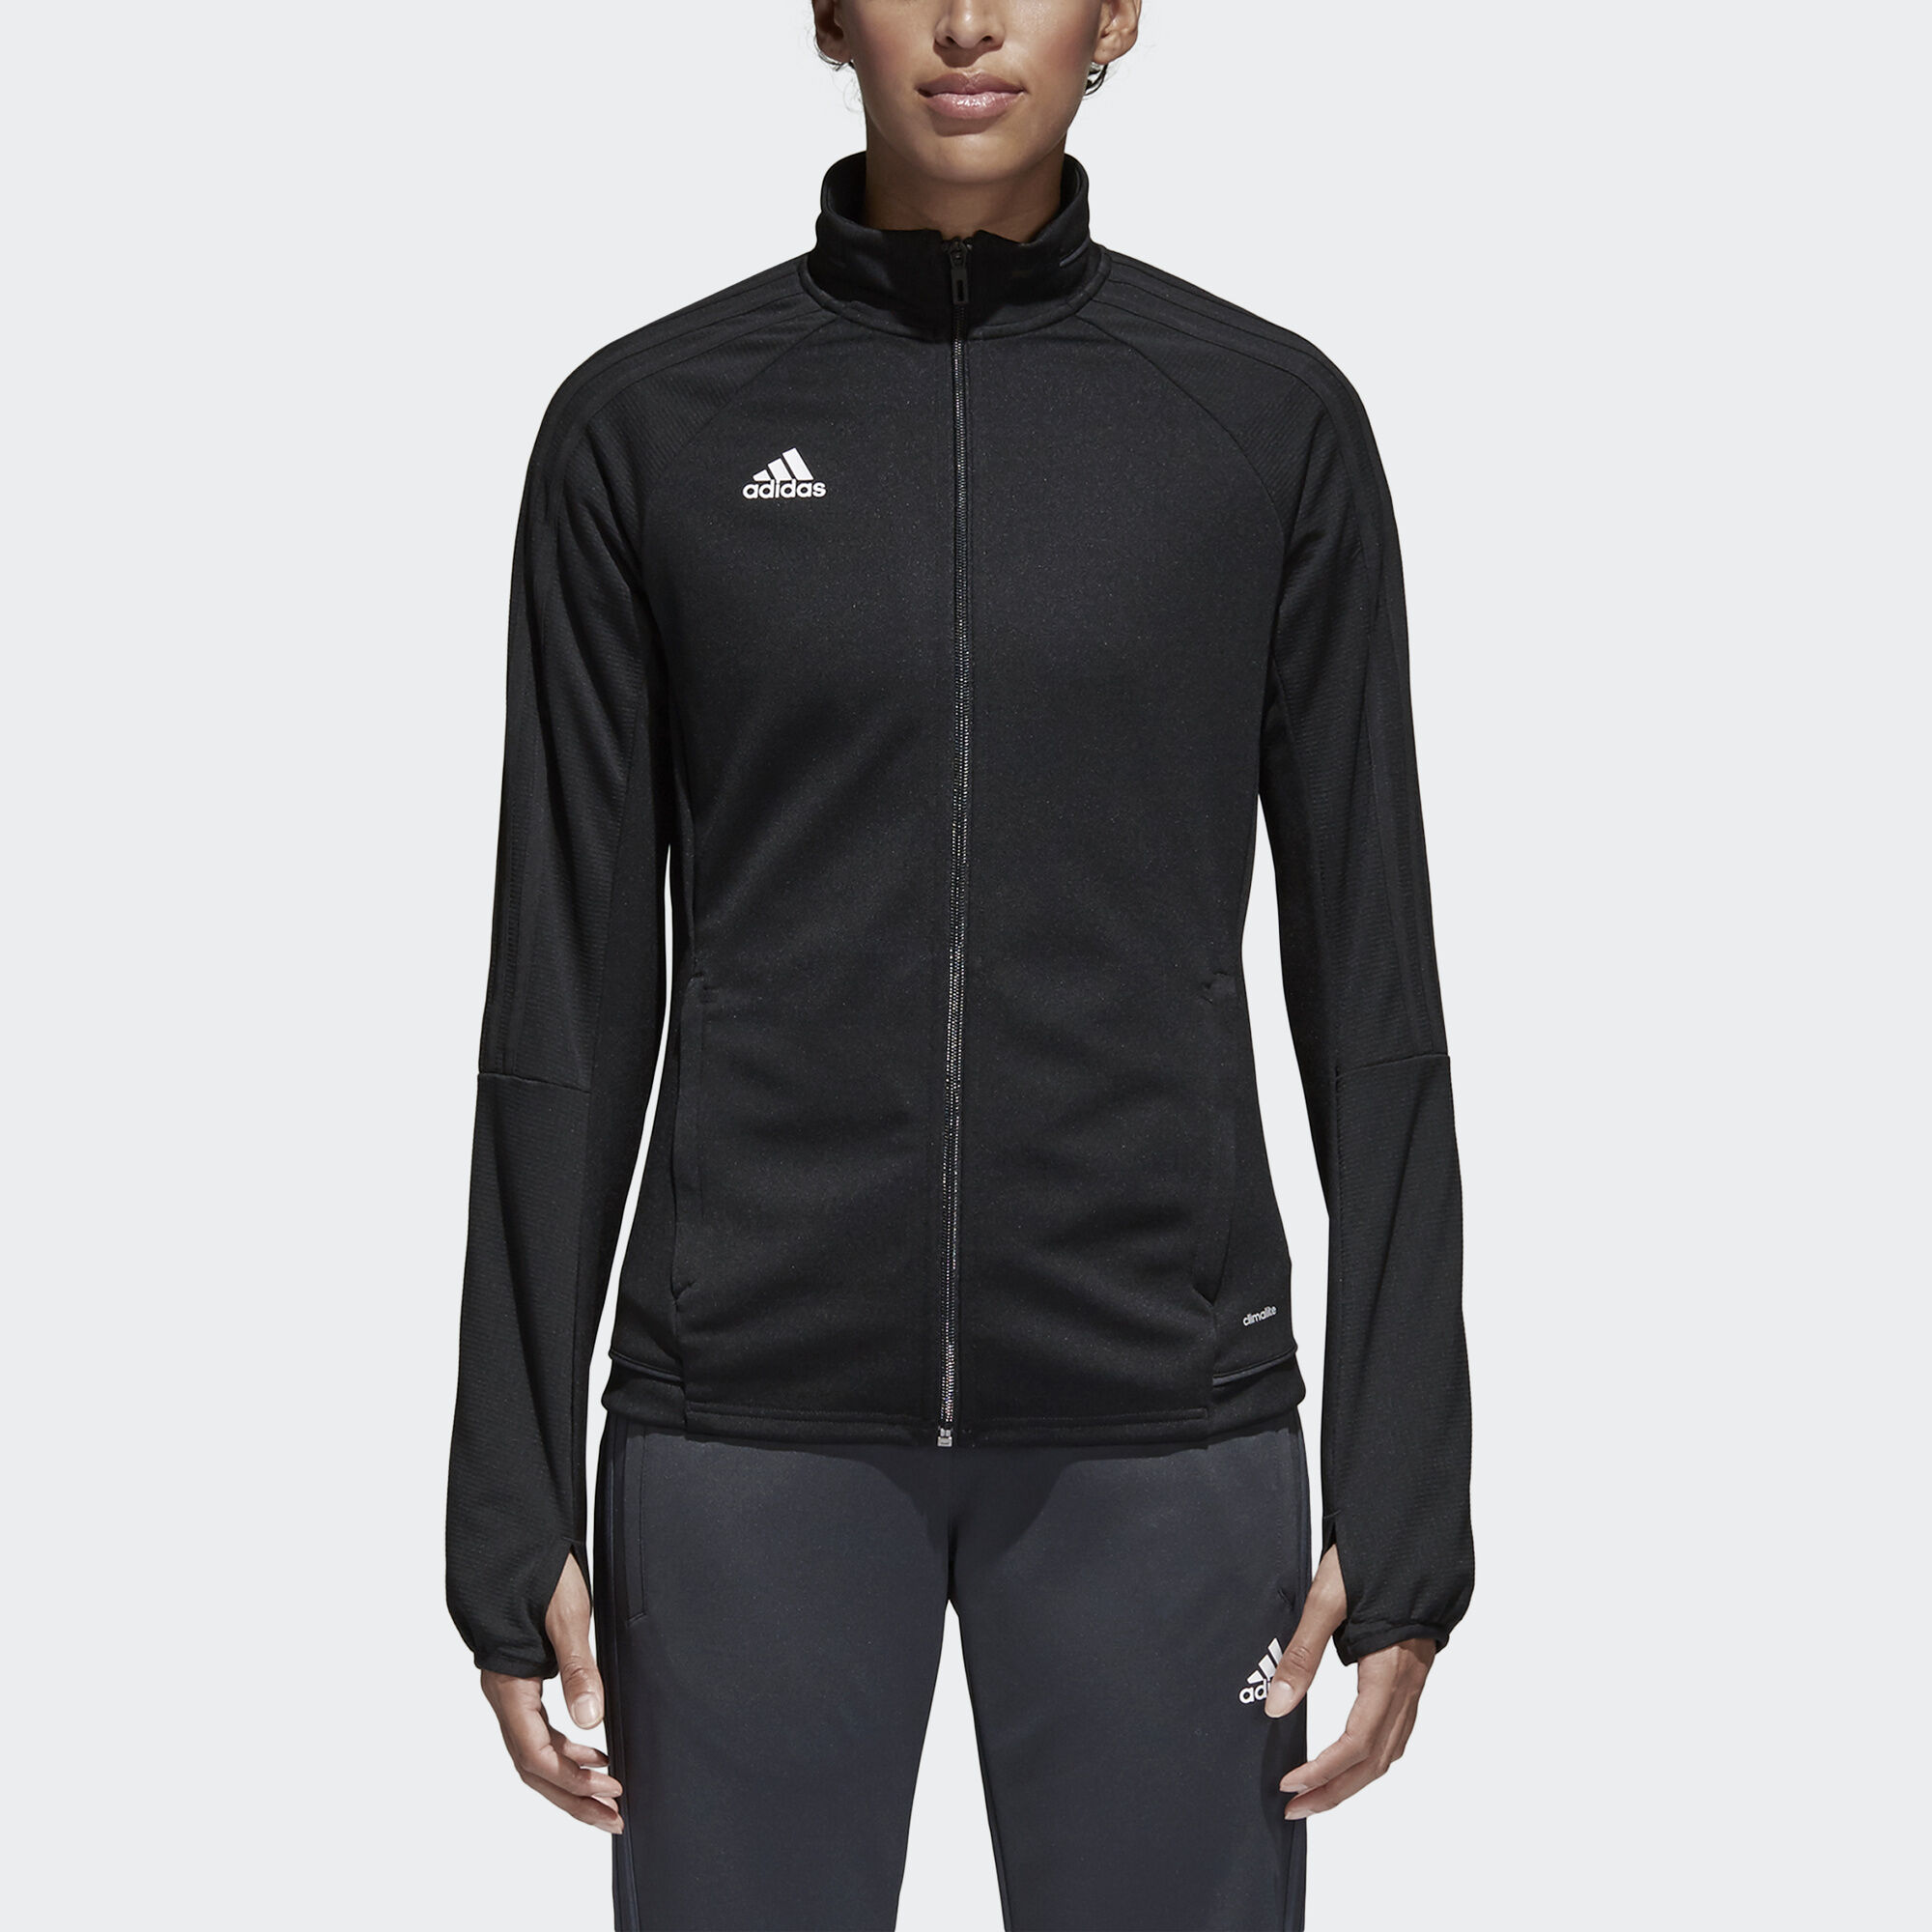 sold>adidas black jacket white stripes,pureboosts,adidas ...